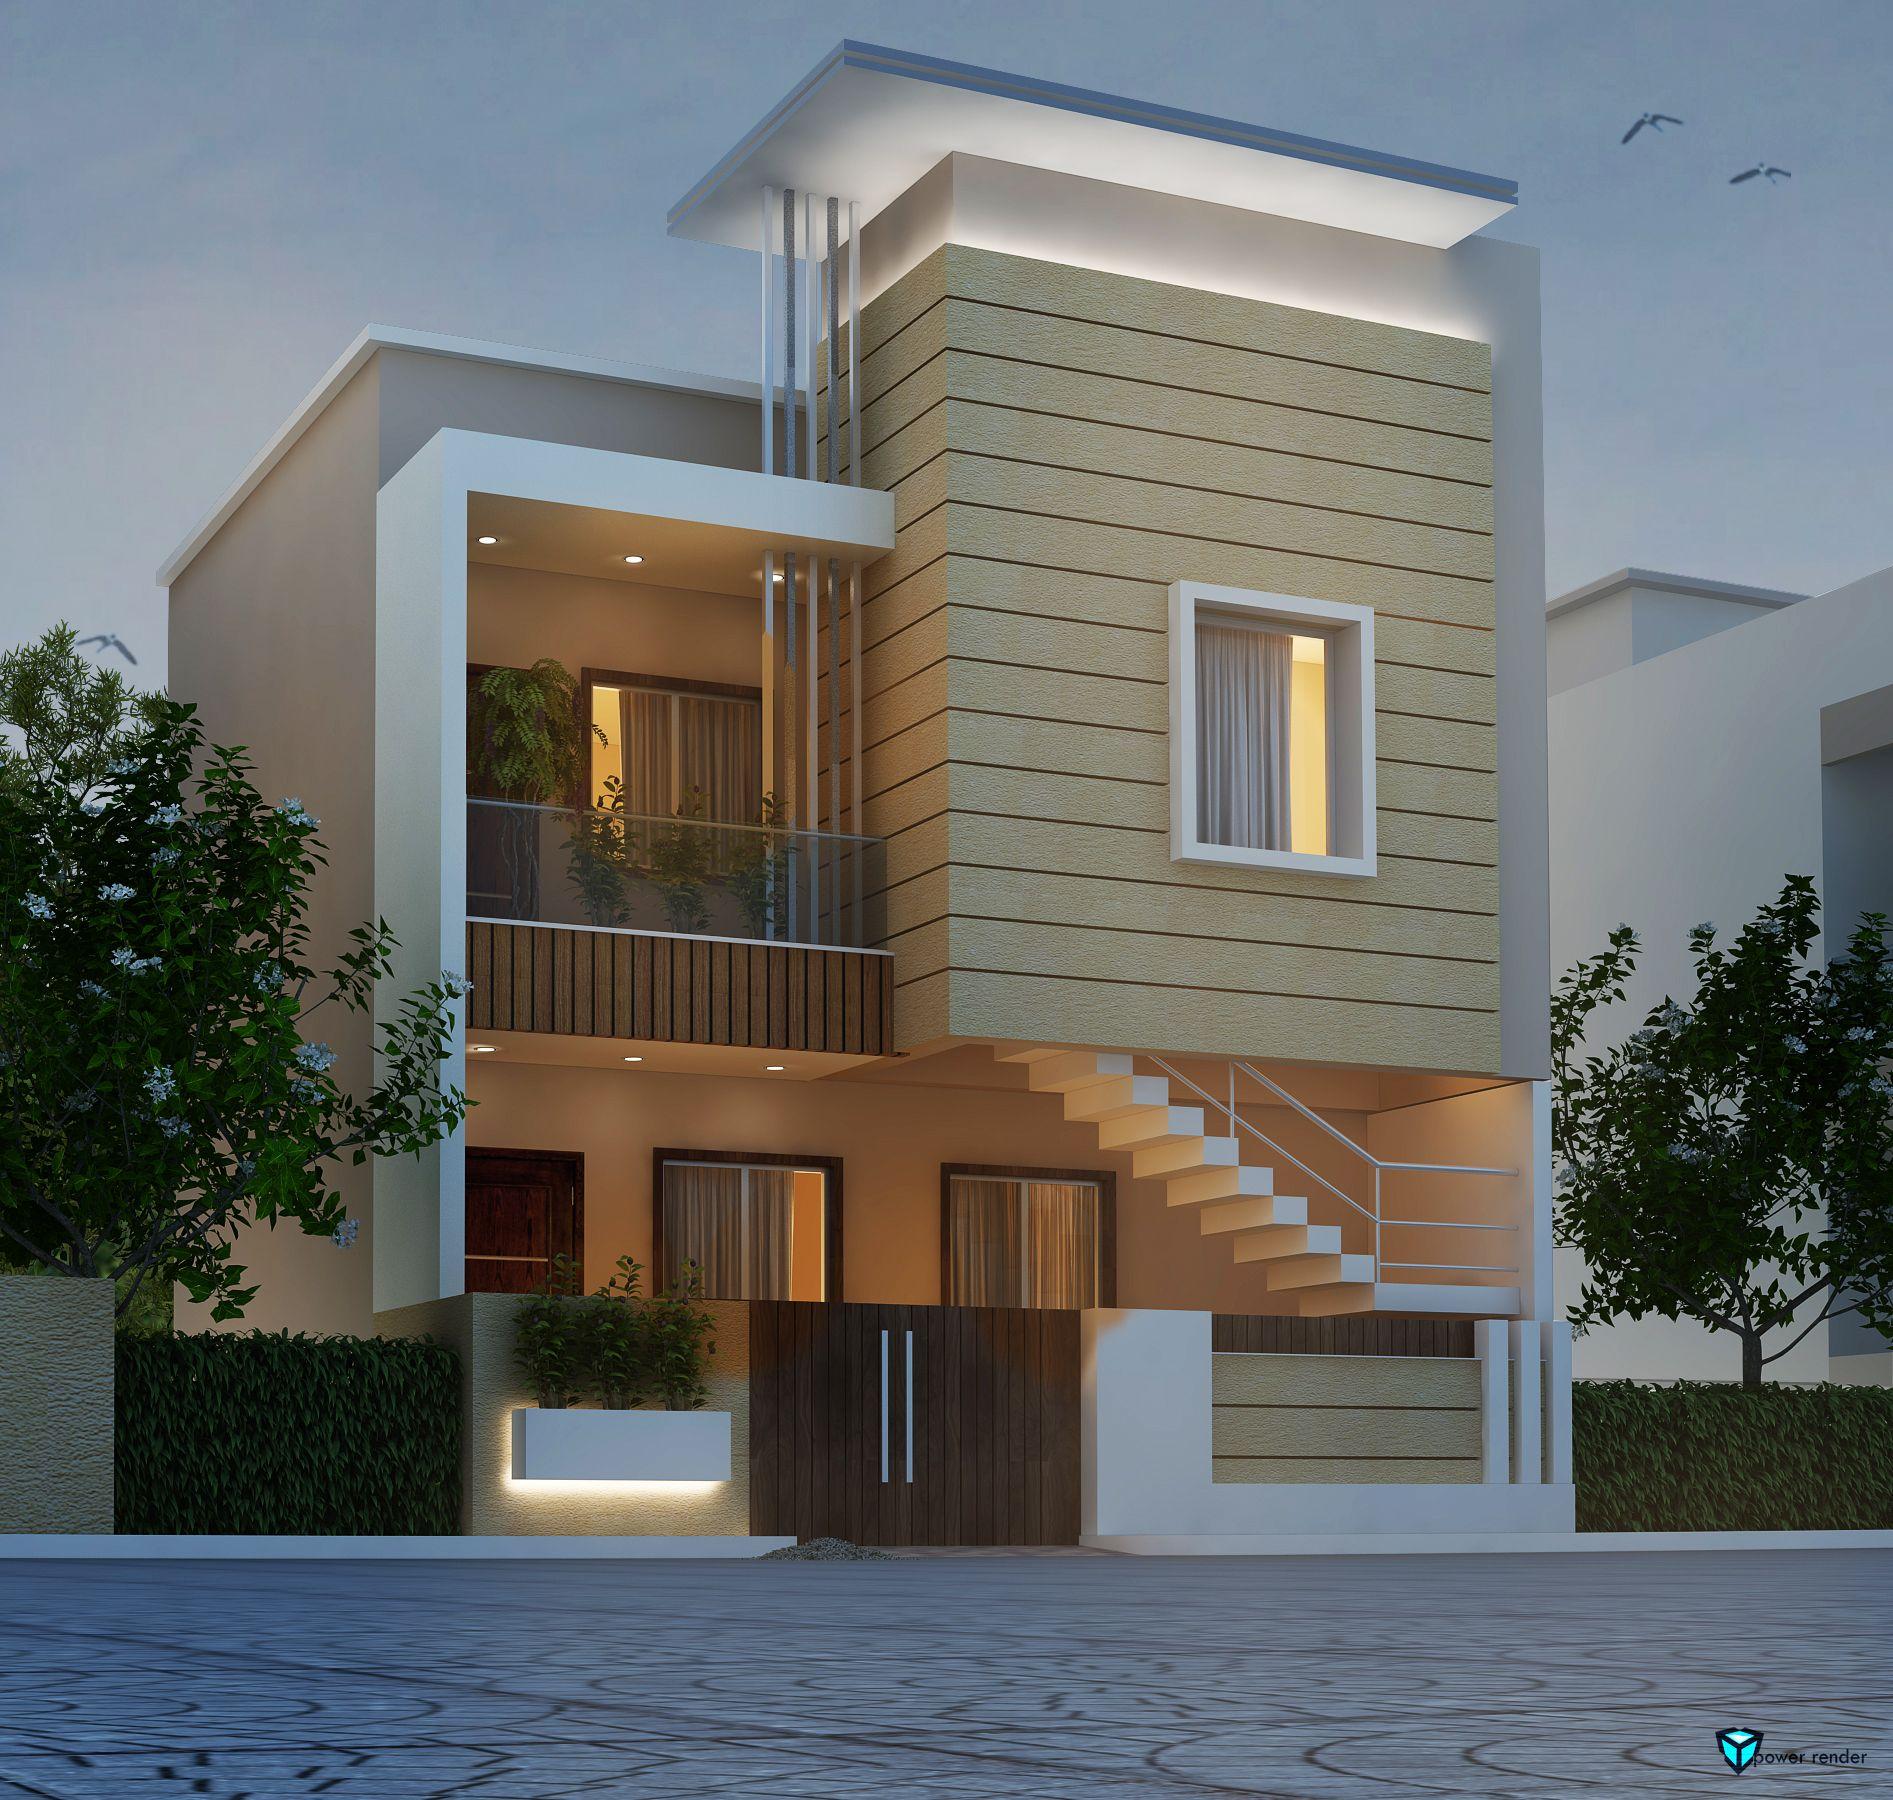 Architecture also  architectural visualization exterior night rendering modern rh pinterest